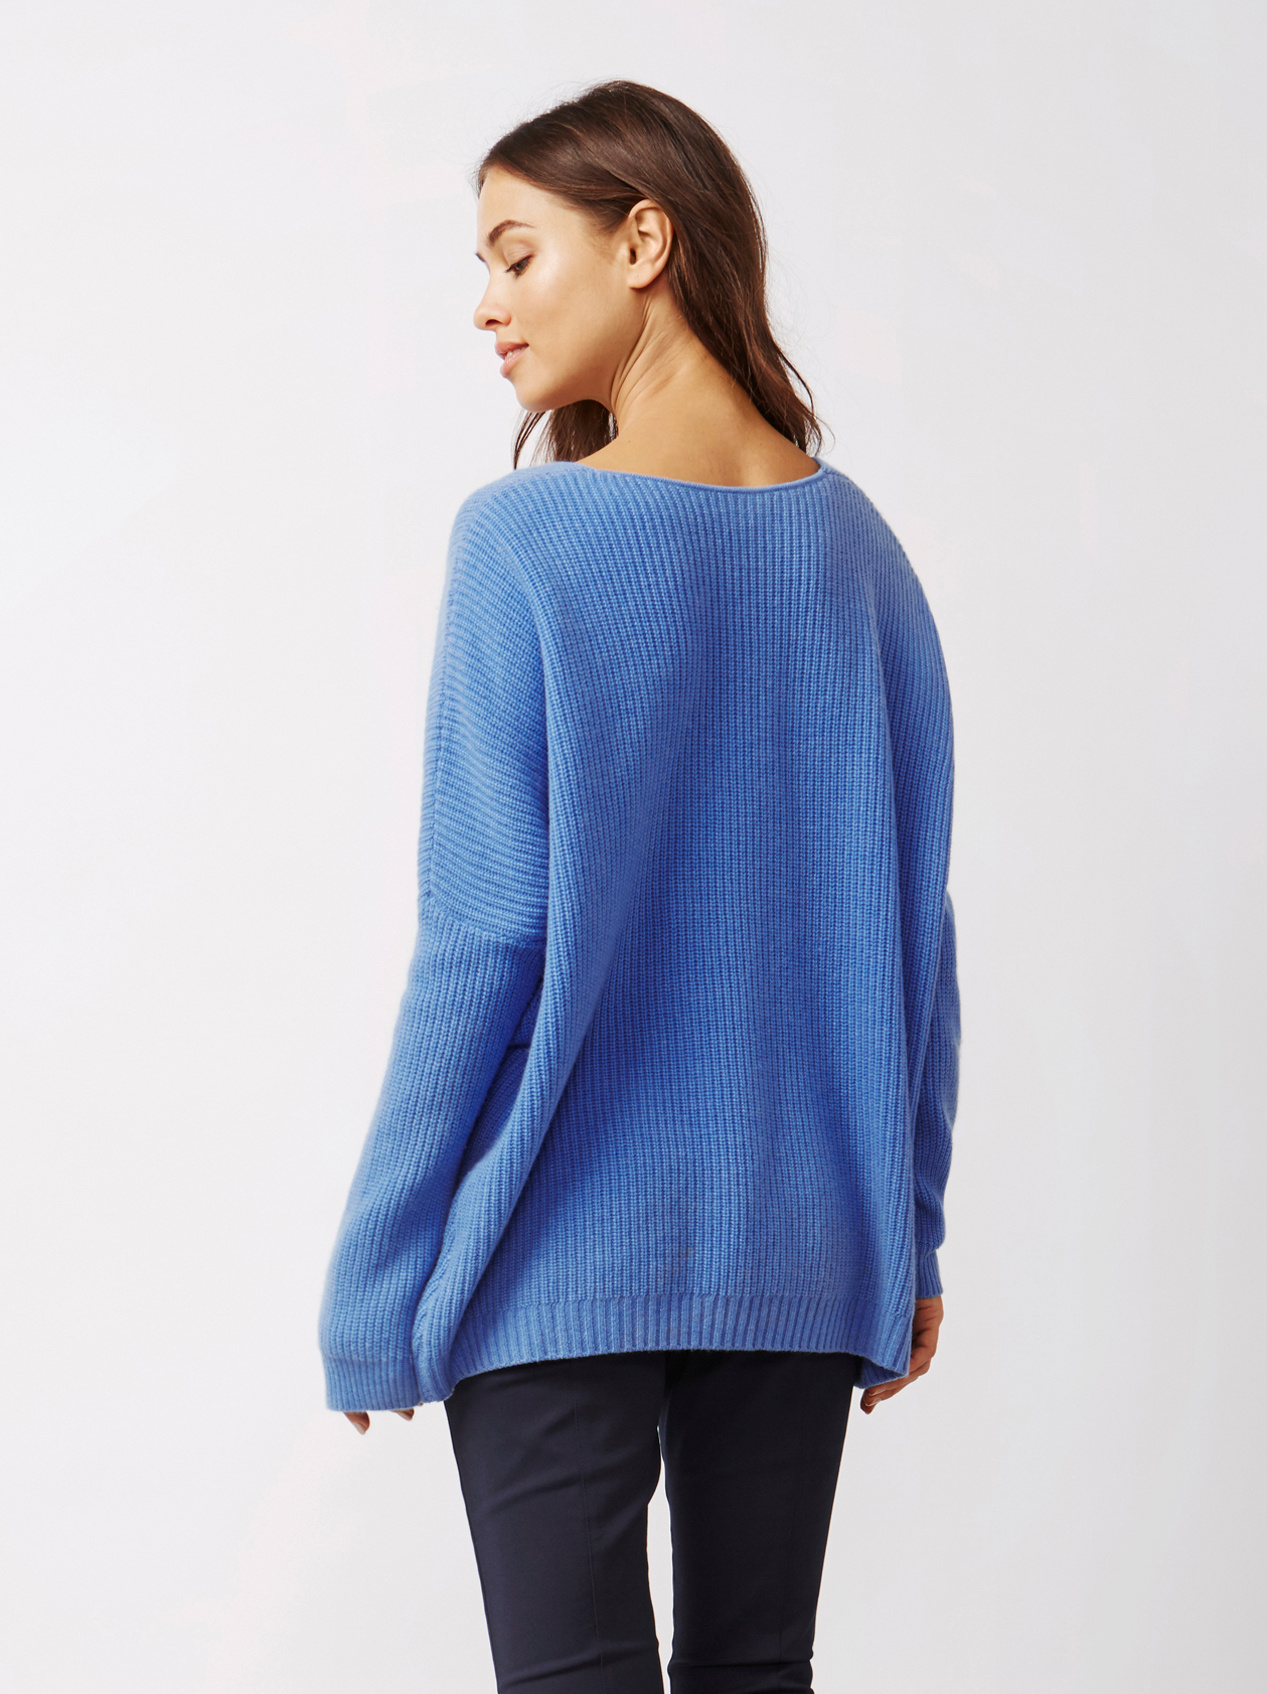 Soft Goat Women's Chunky V-Neck Sweater Sky Blue